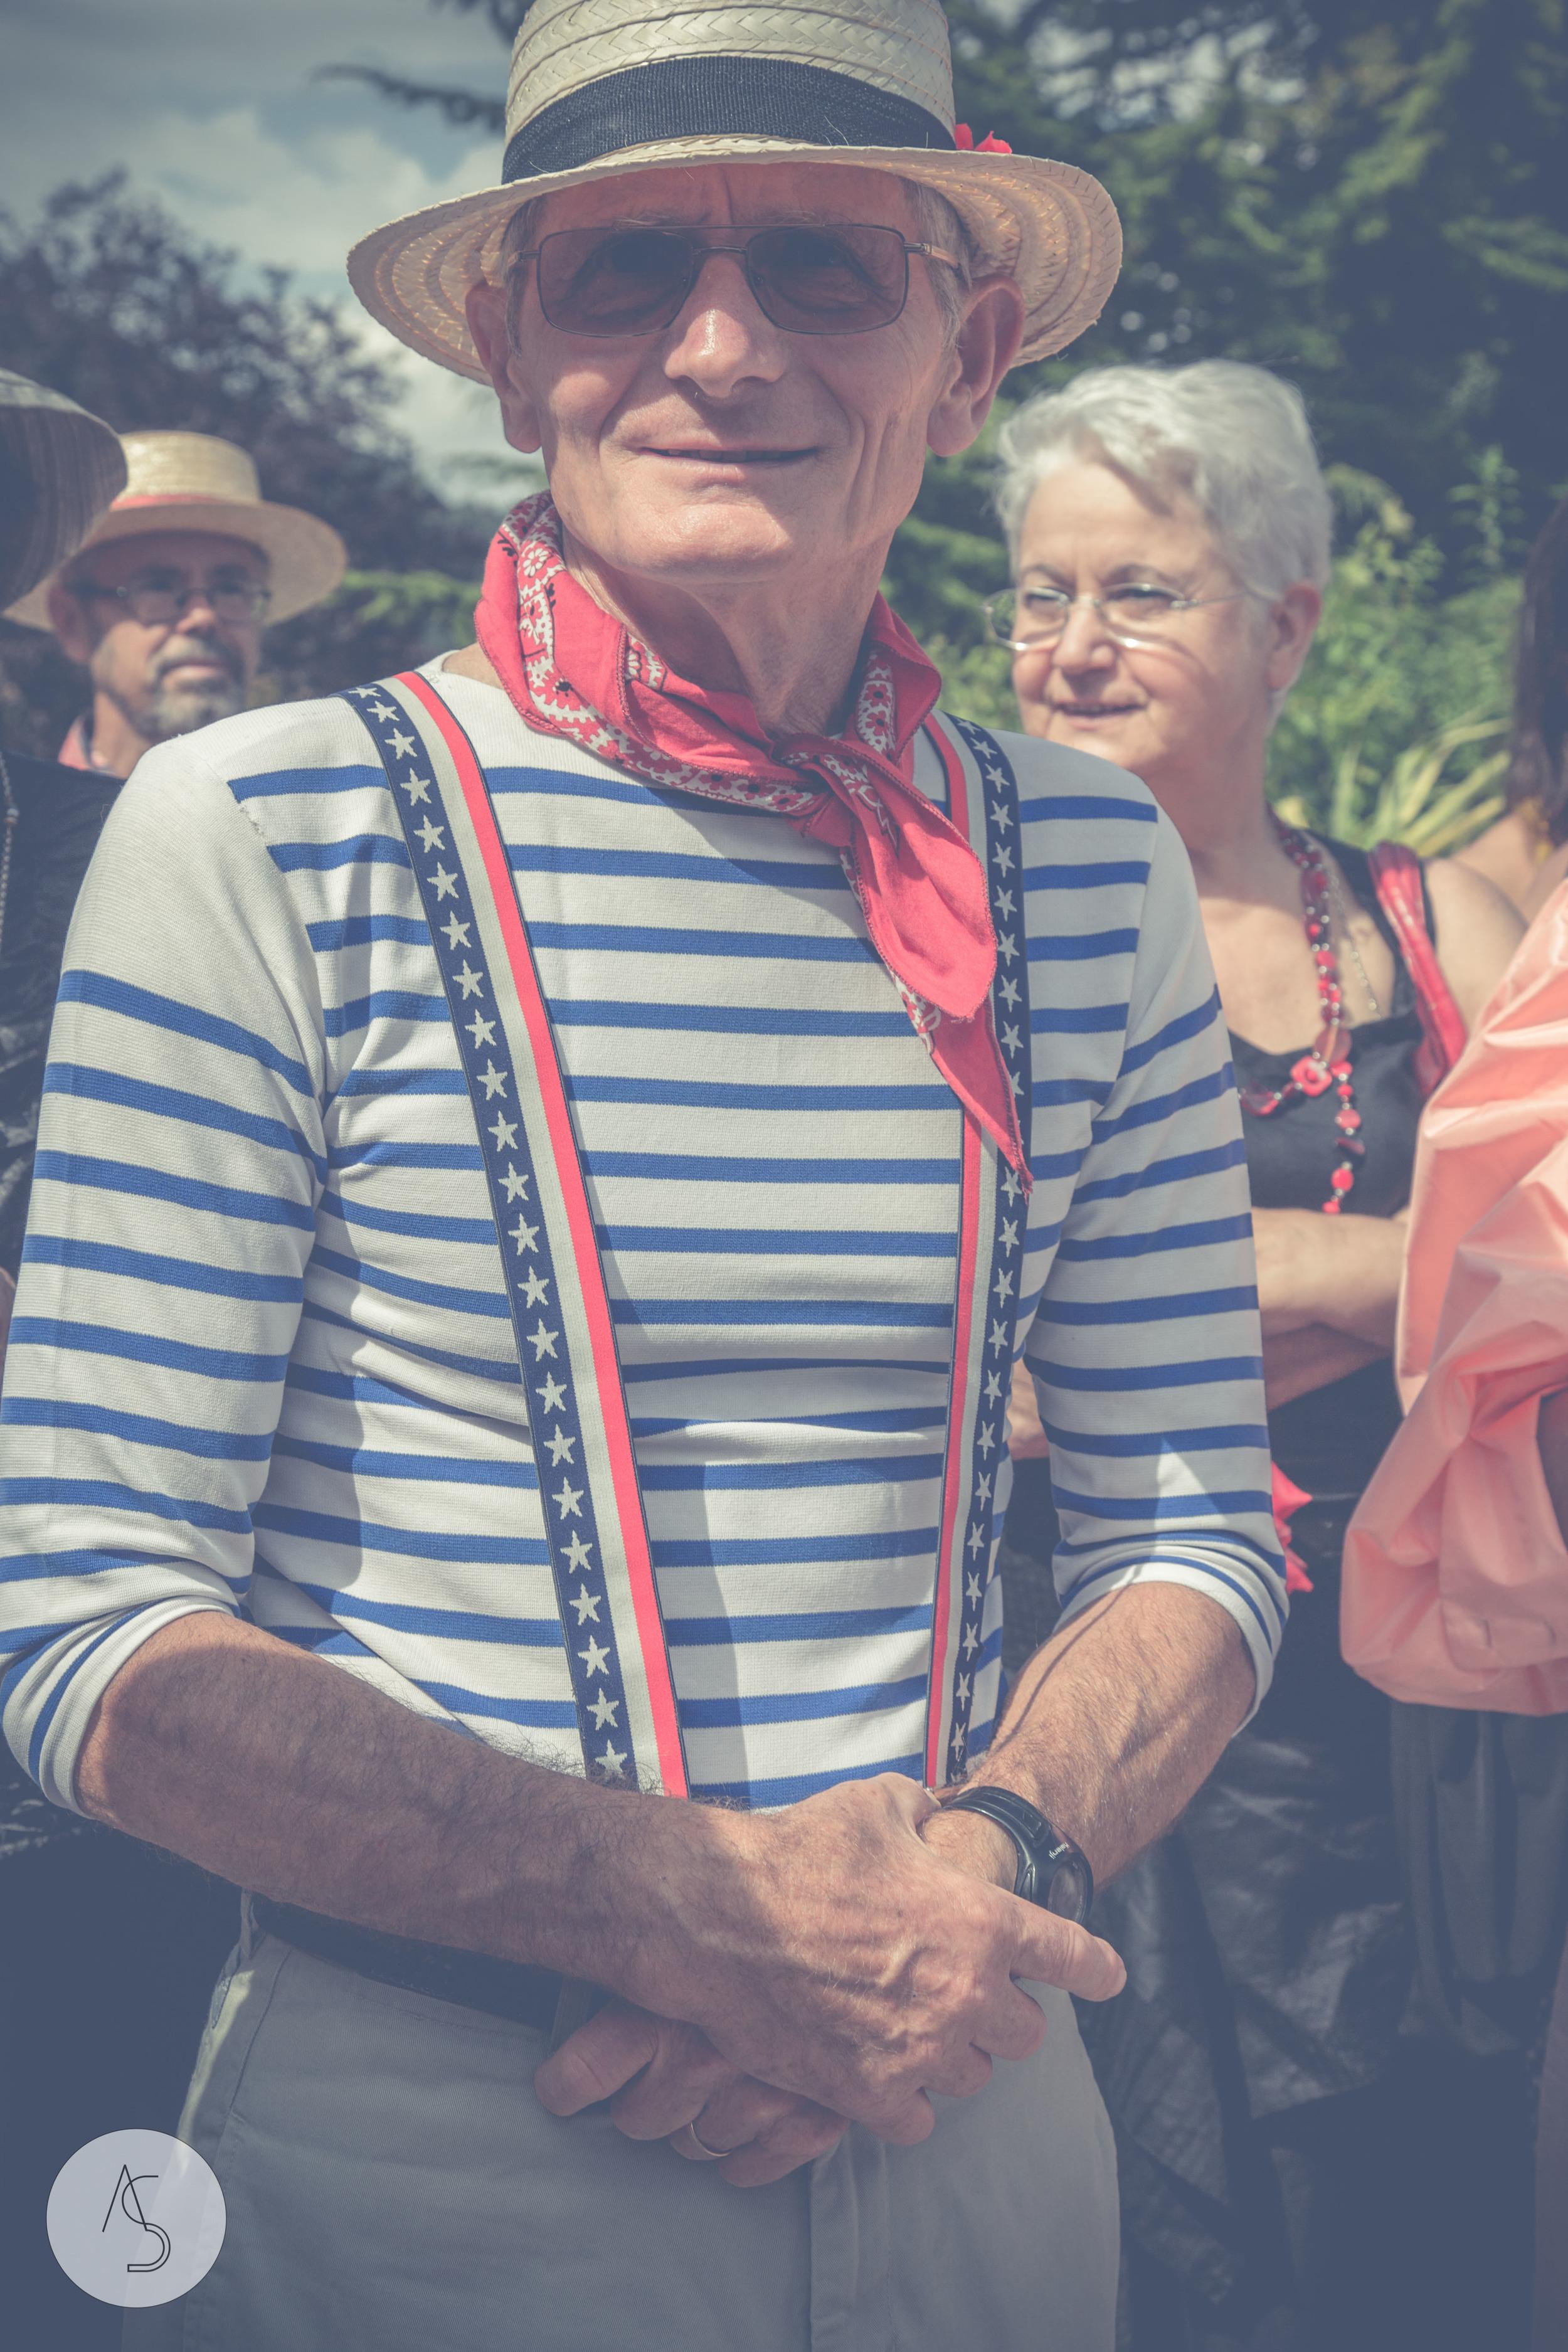 photographe mariage - Grenoble - Rhone Alpes - Adriana Salazar photo-83.jpg